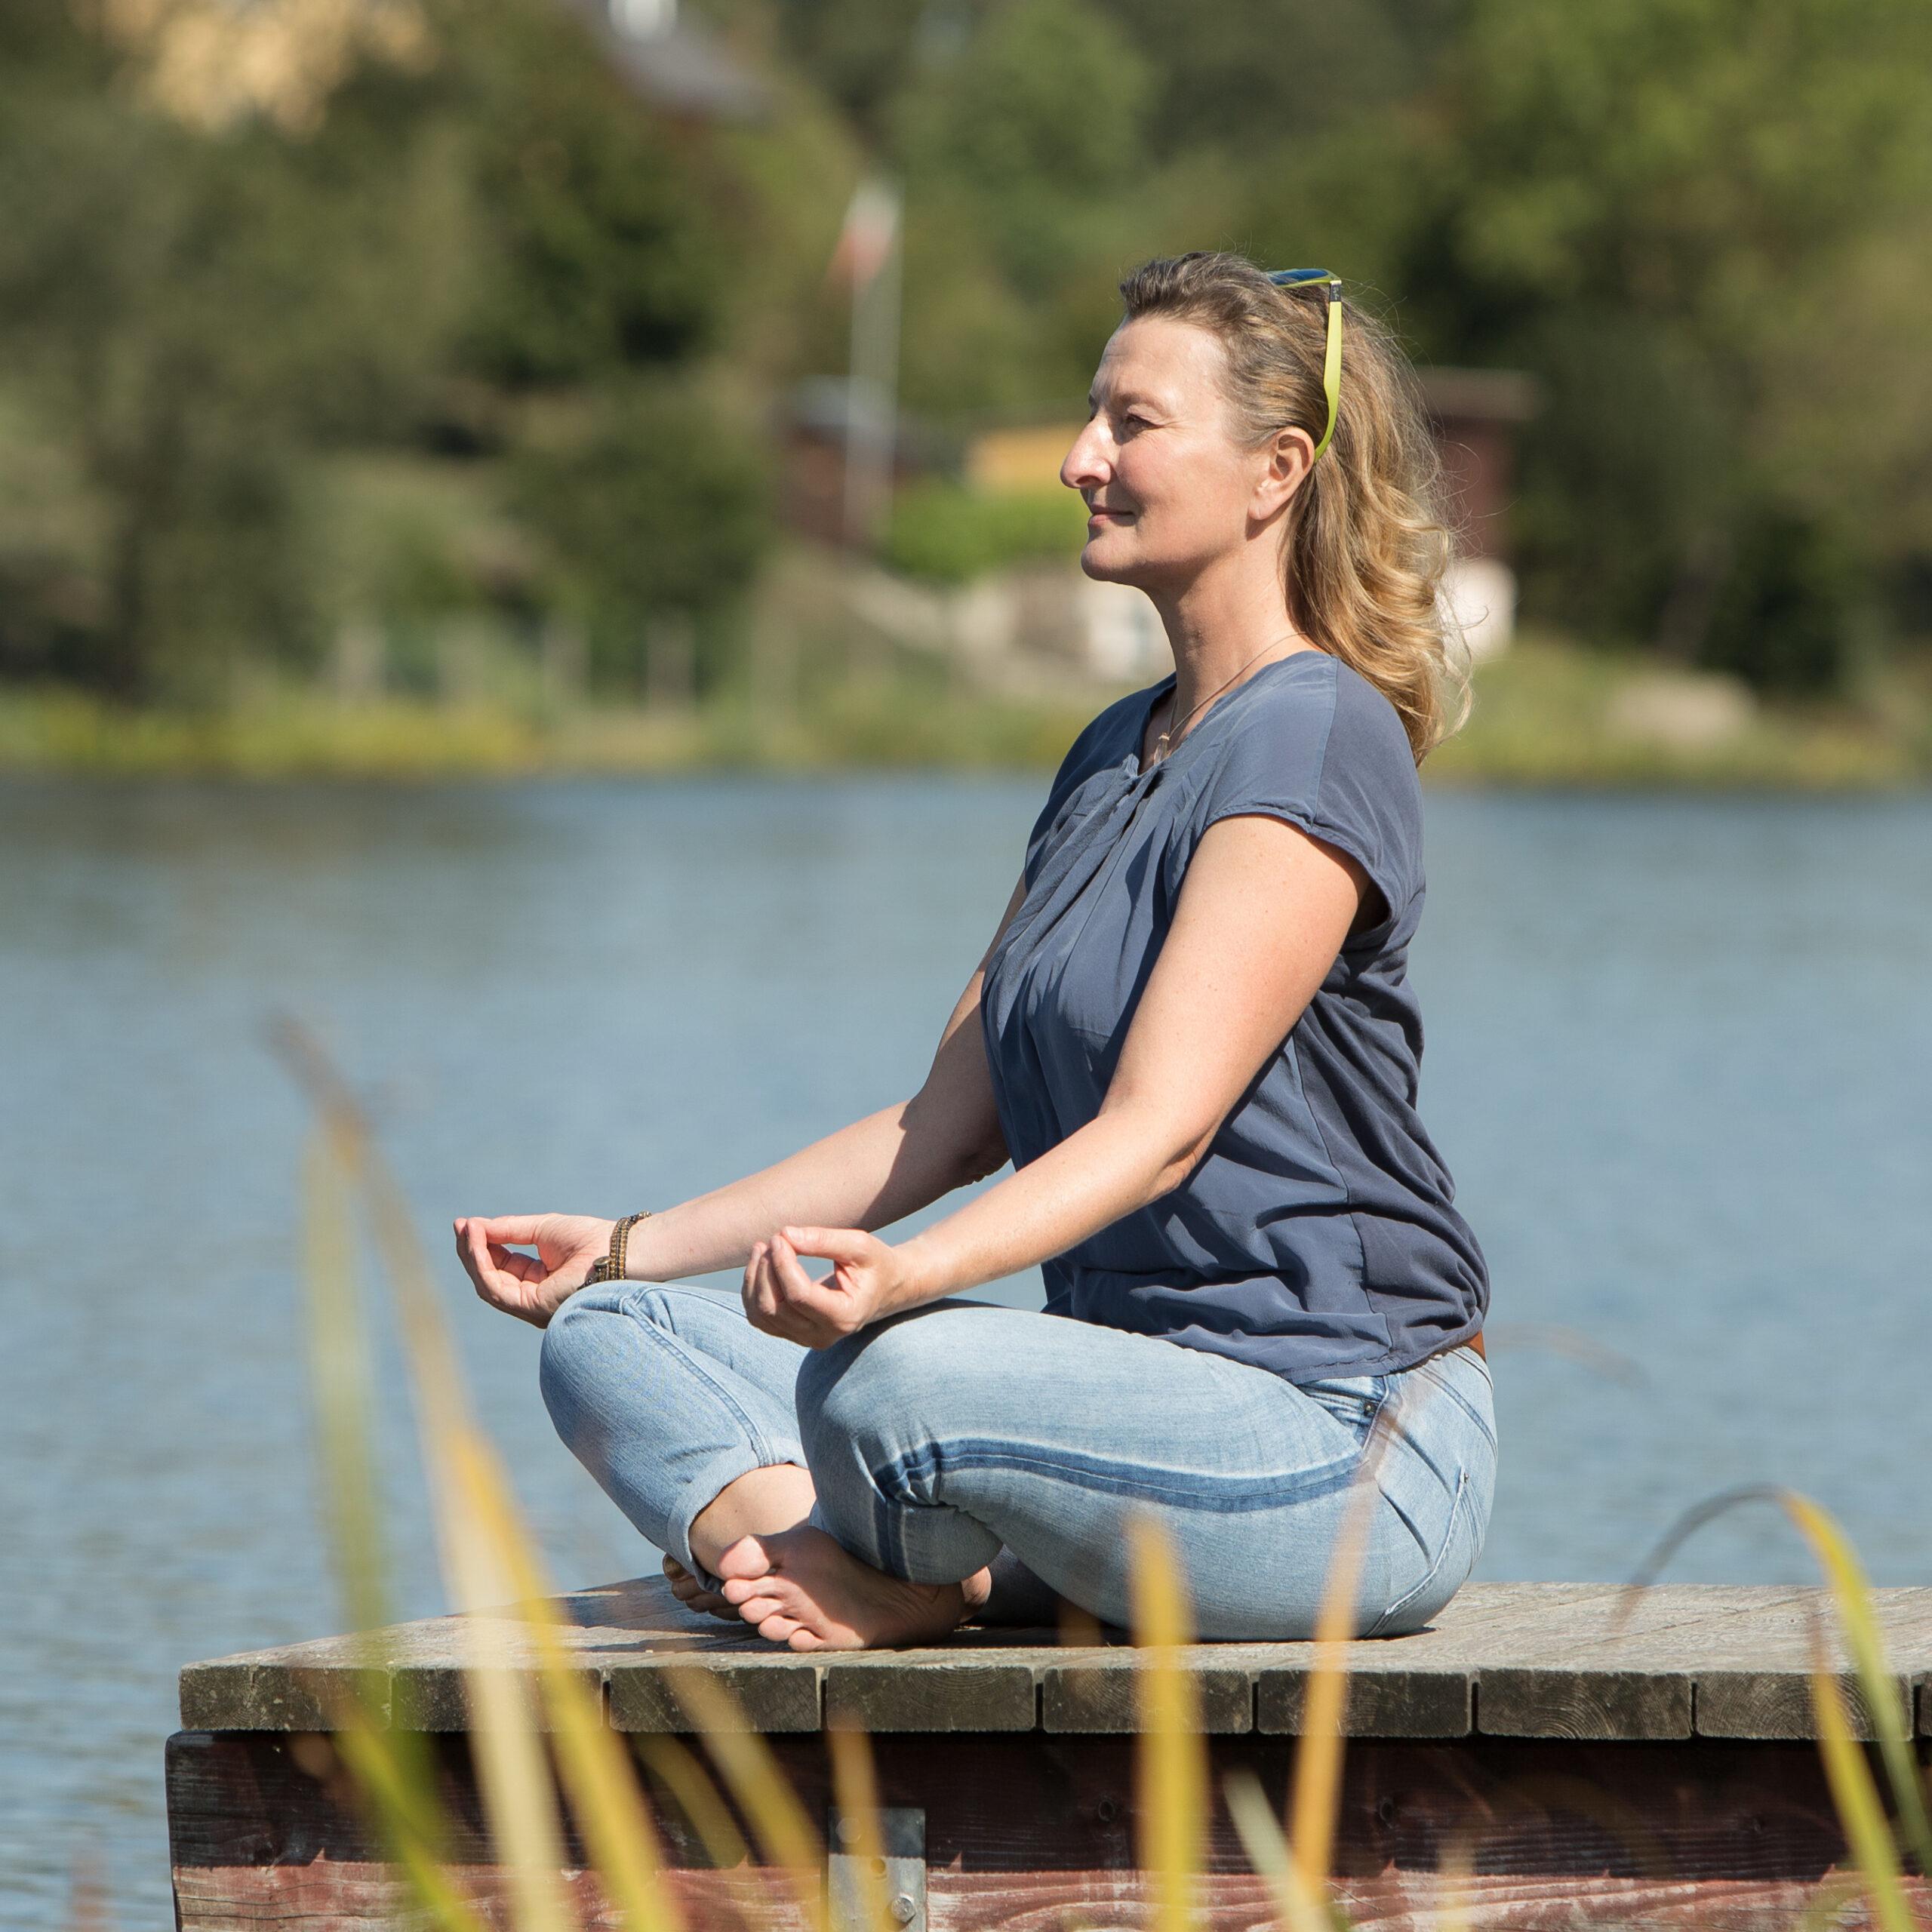 Stressabbau Entspannung Psychotherapie Kinesiologie Hof an der Saale Döhlau Entspannung Wellness Reiki Ernährungsberatung mindful-aging Jutta Grenz-Greim